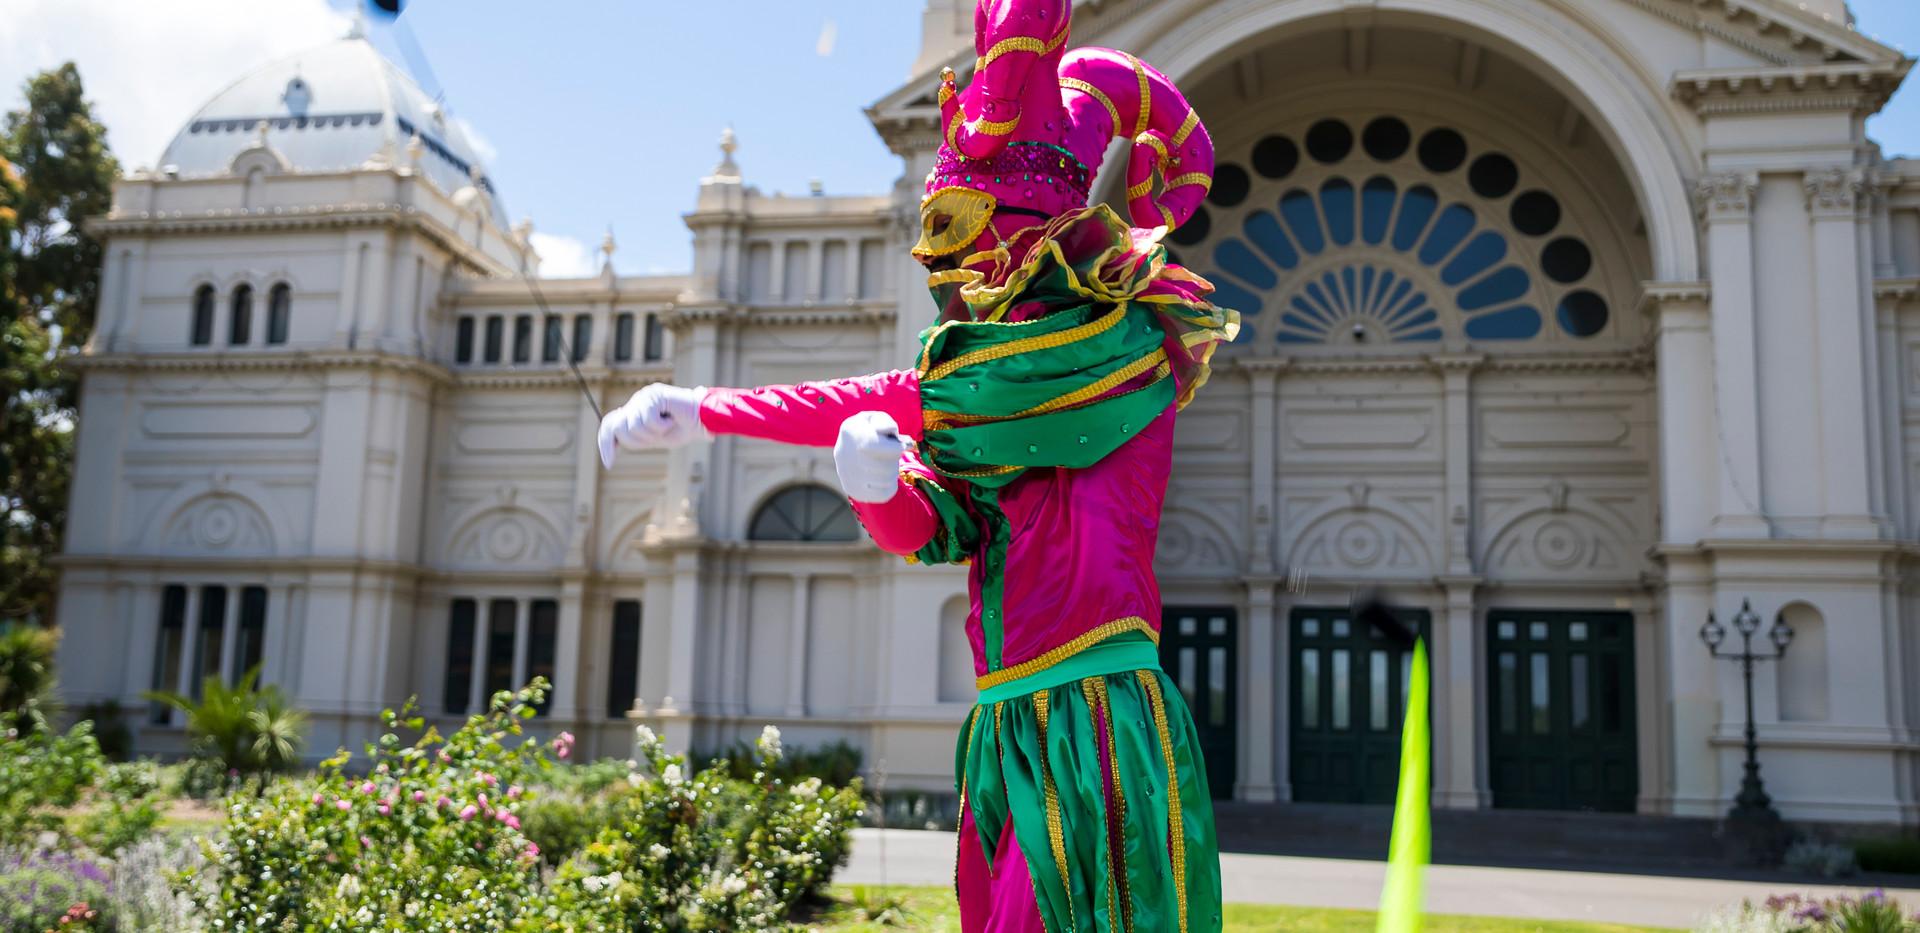 Harlequin roving performer